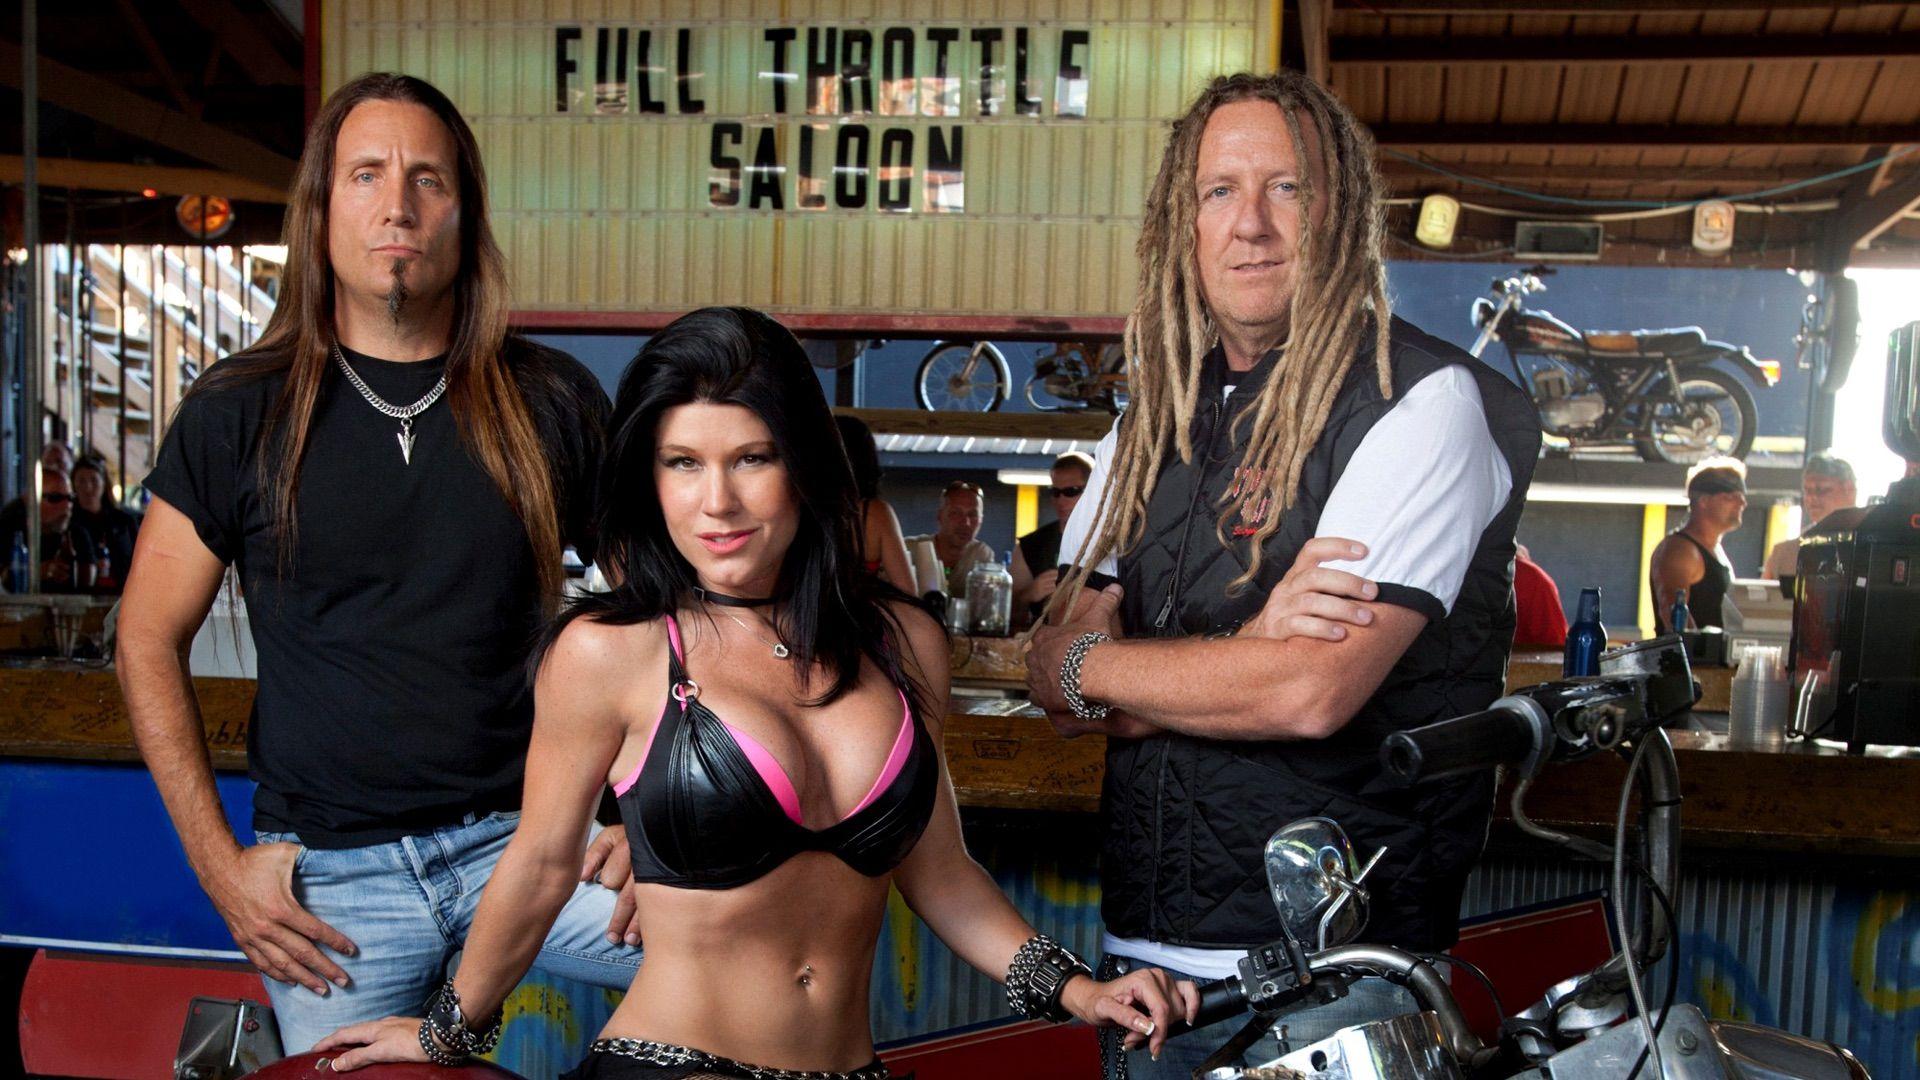 Full Throttle Saloon Bartenders 2012